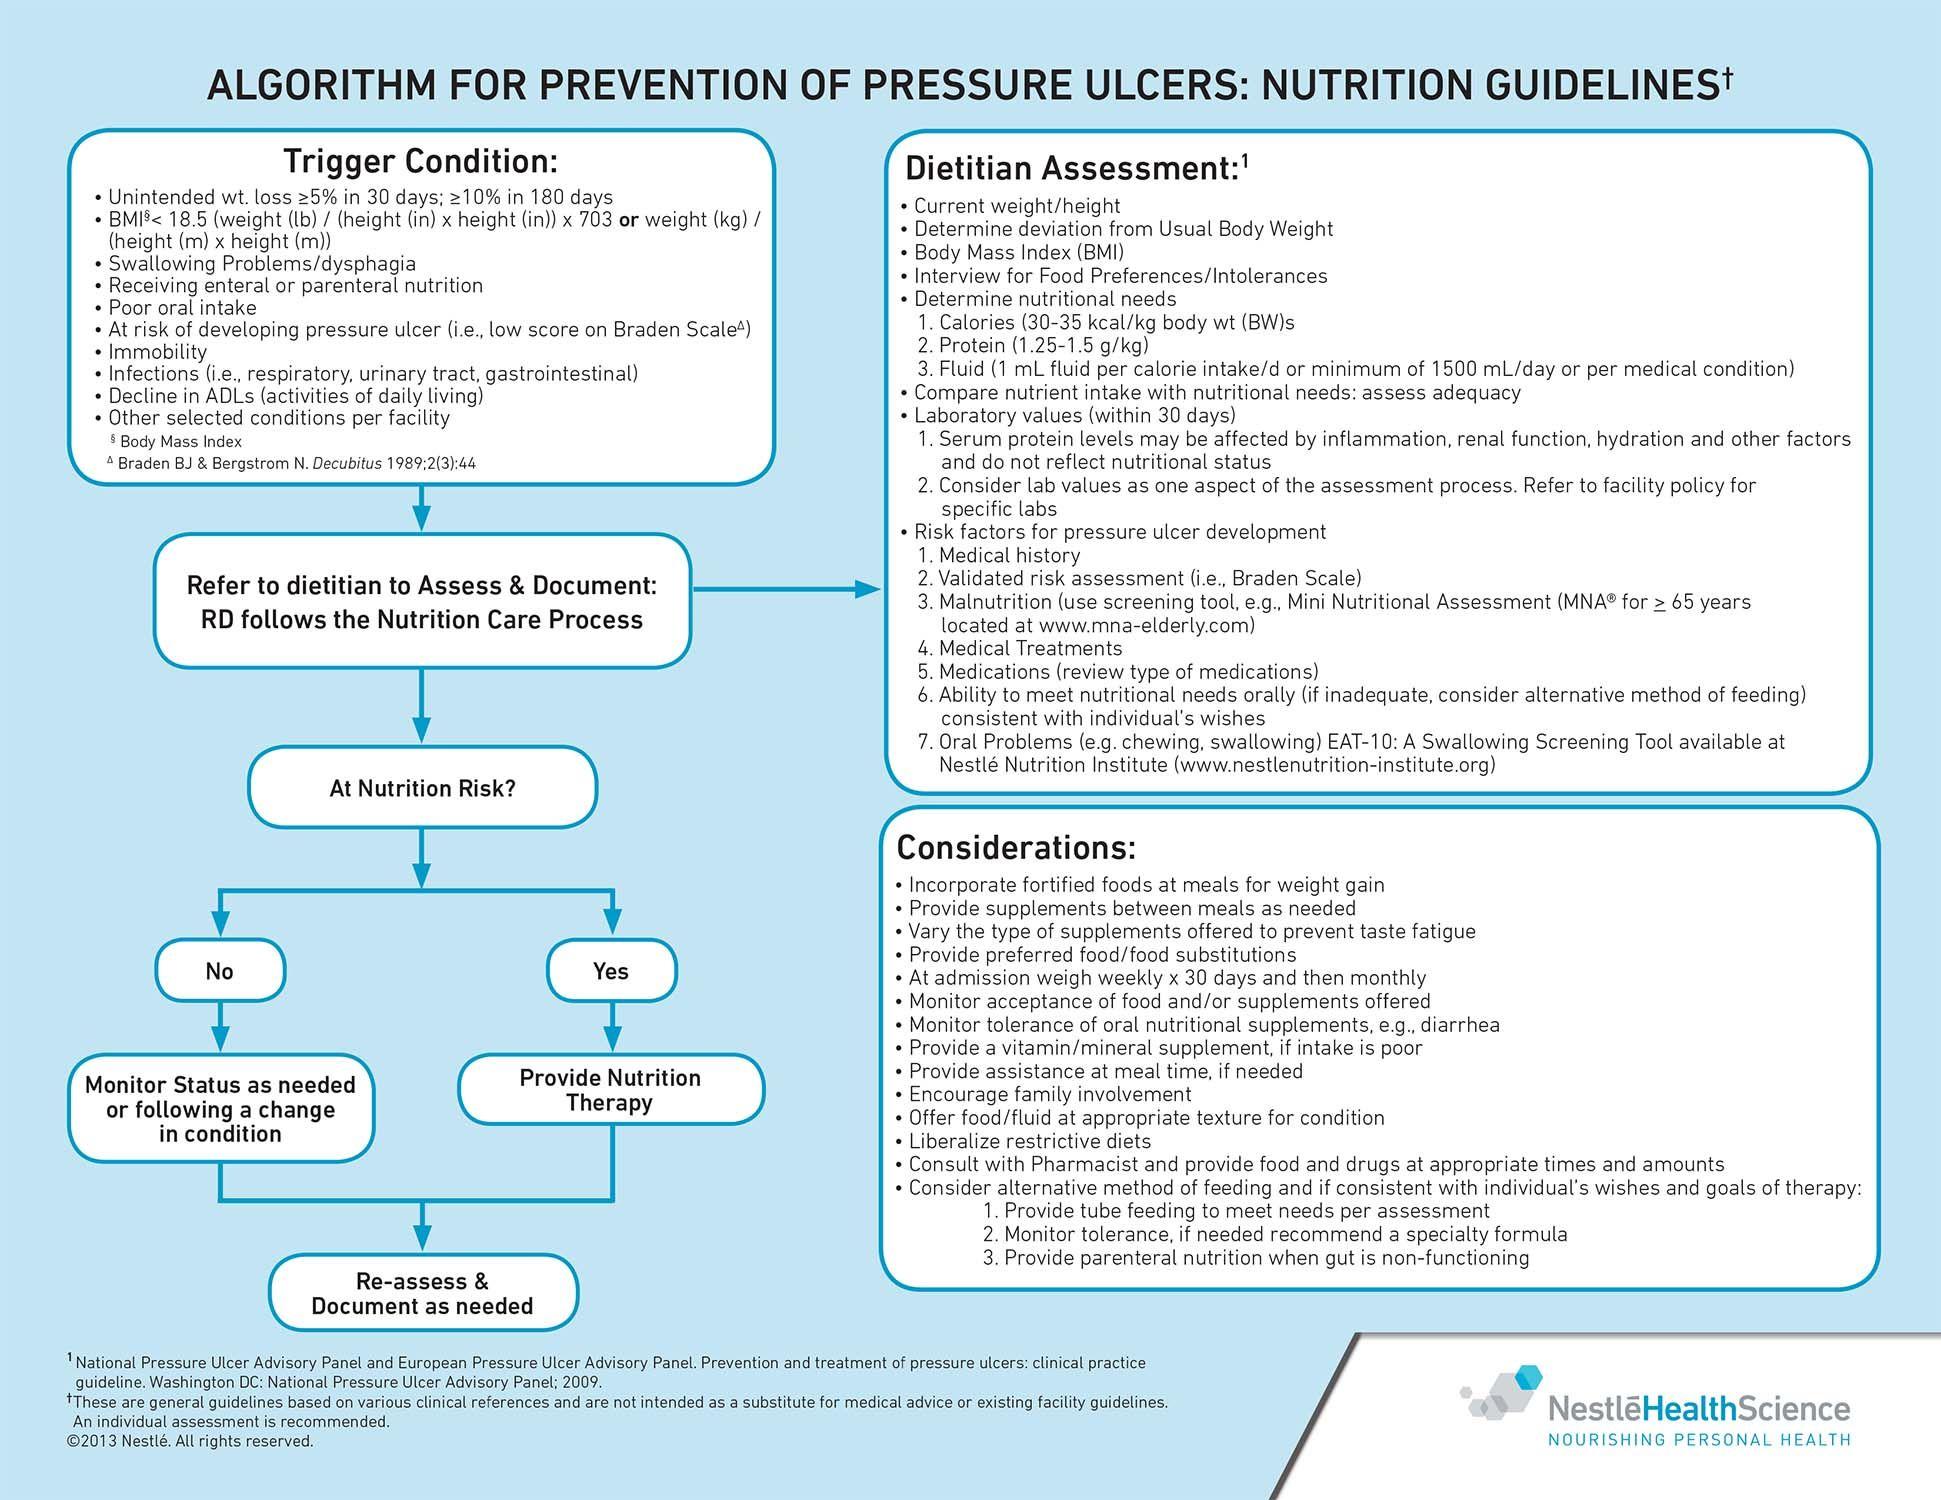 algorithm for prevention of pressure ulcers nutrition guidelines rh pinterest com sacrum vs coccyx pressure ulcer diagram pressure ulcer location diagram [ 1941 x 1500 Pixel ]